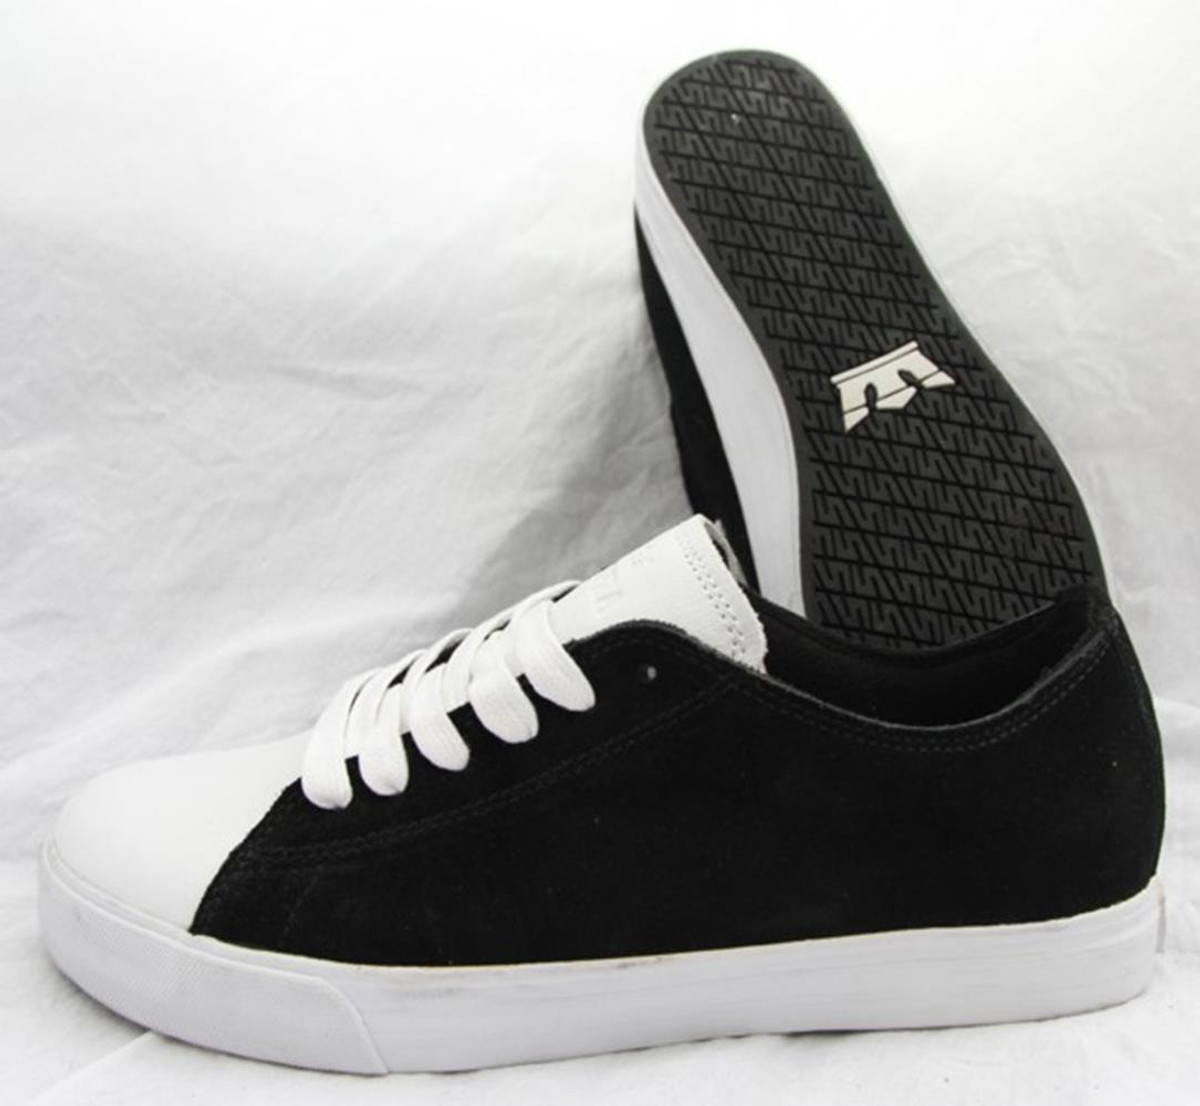 SUPRA Skateboard Styler Schuhe Thunder Low Low Low schwarz Weiß 6fd2ad